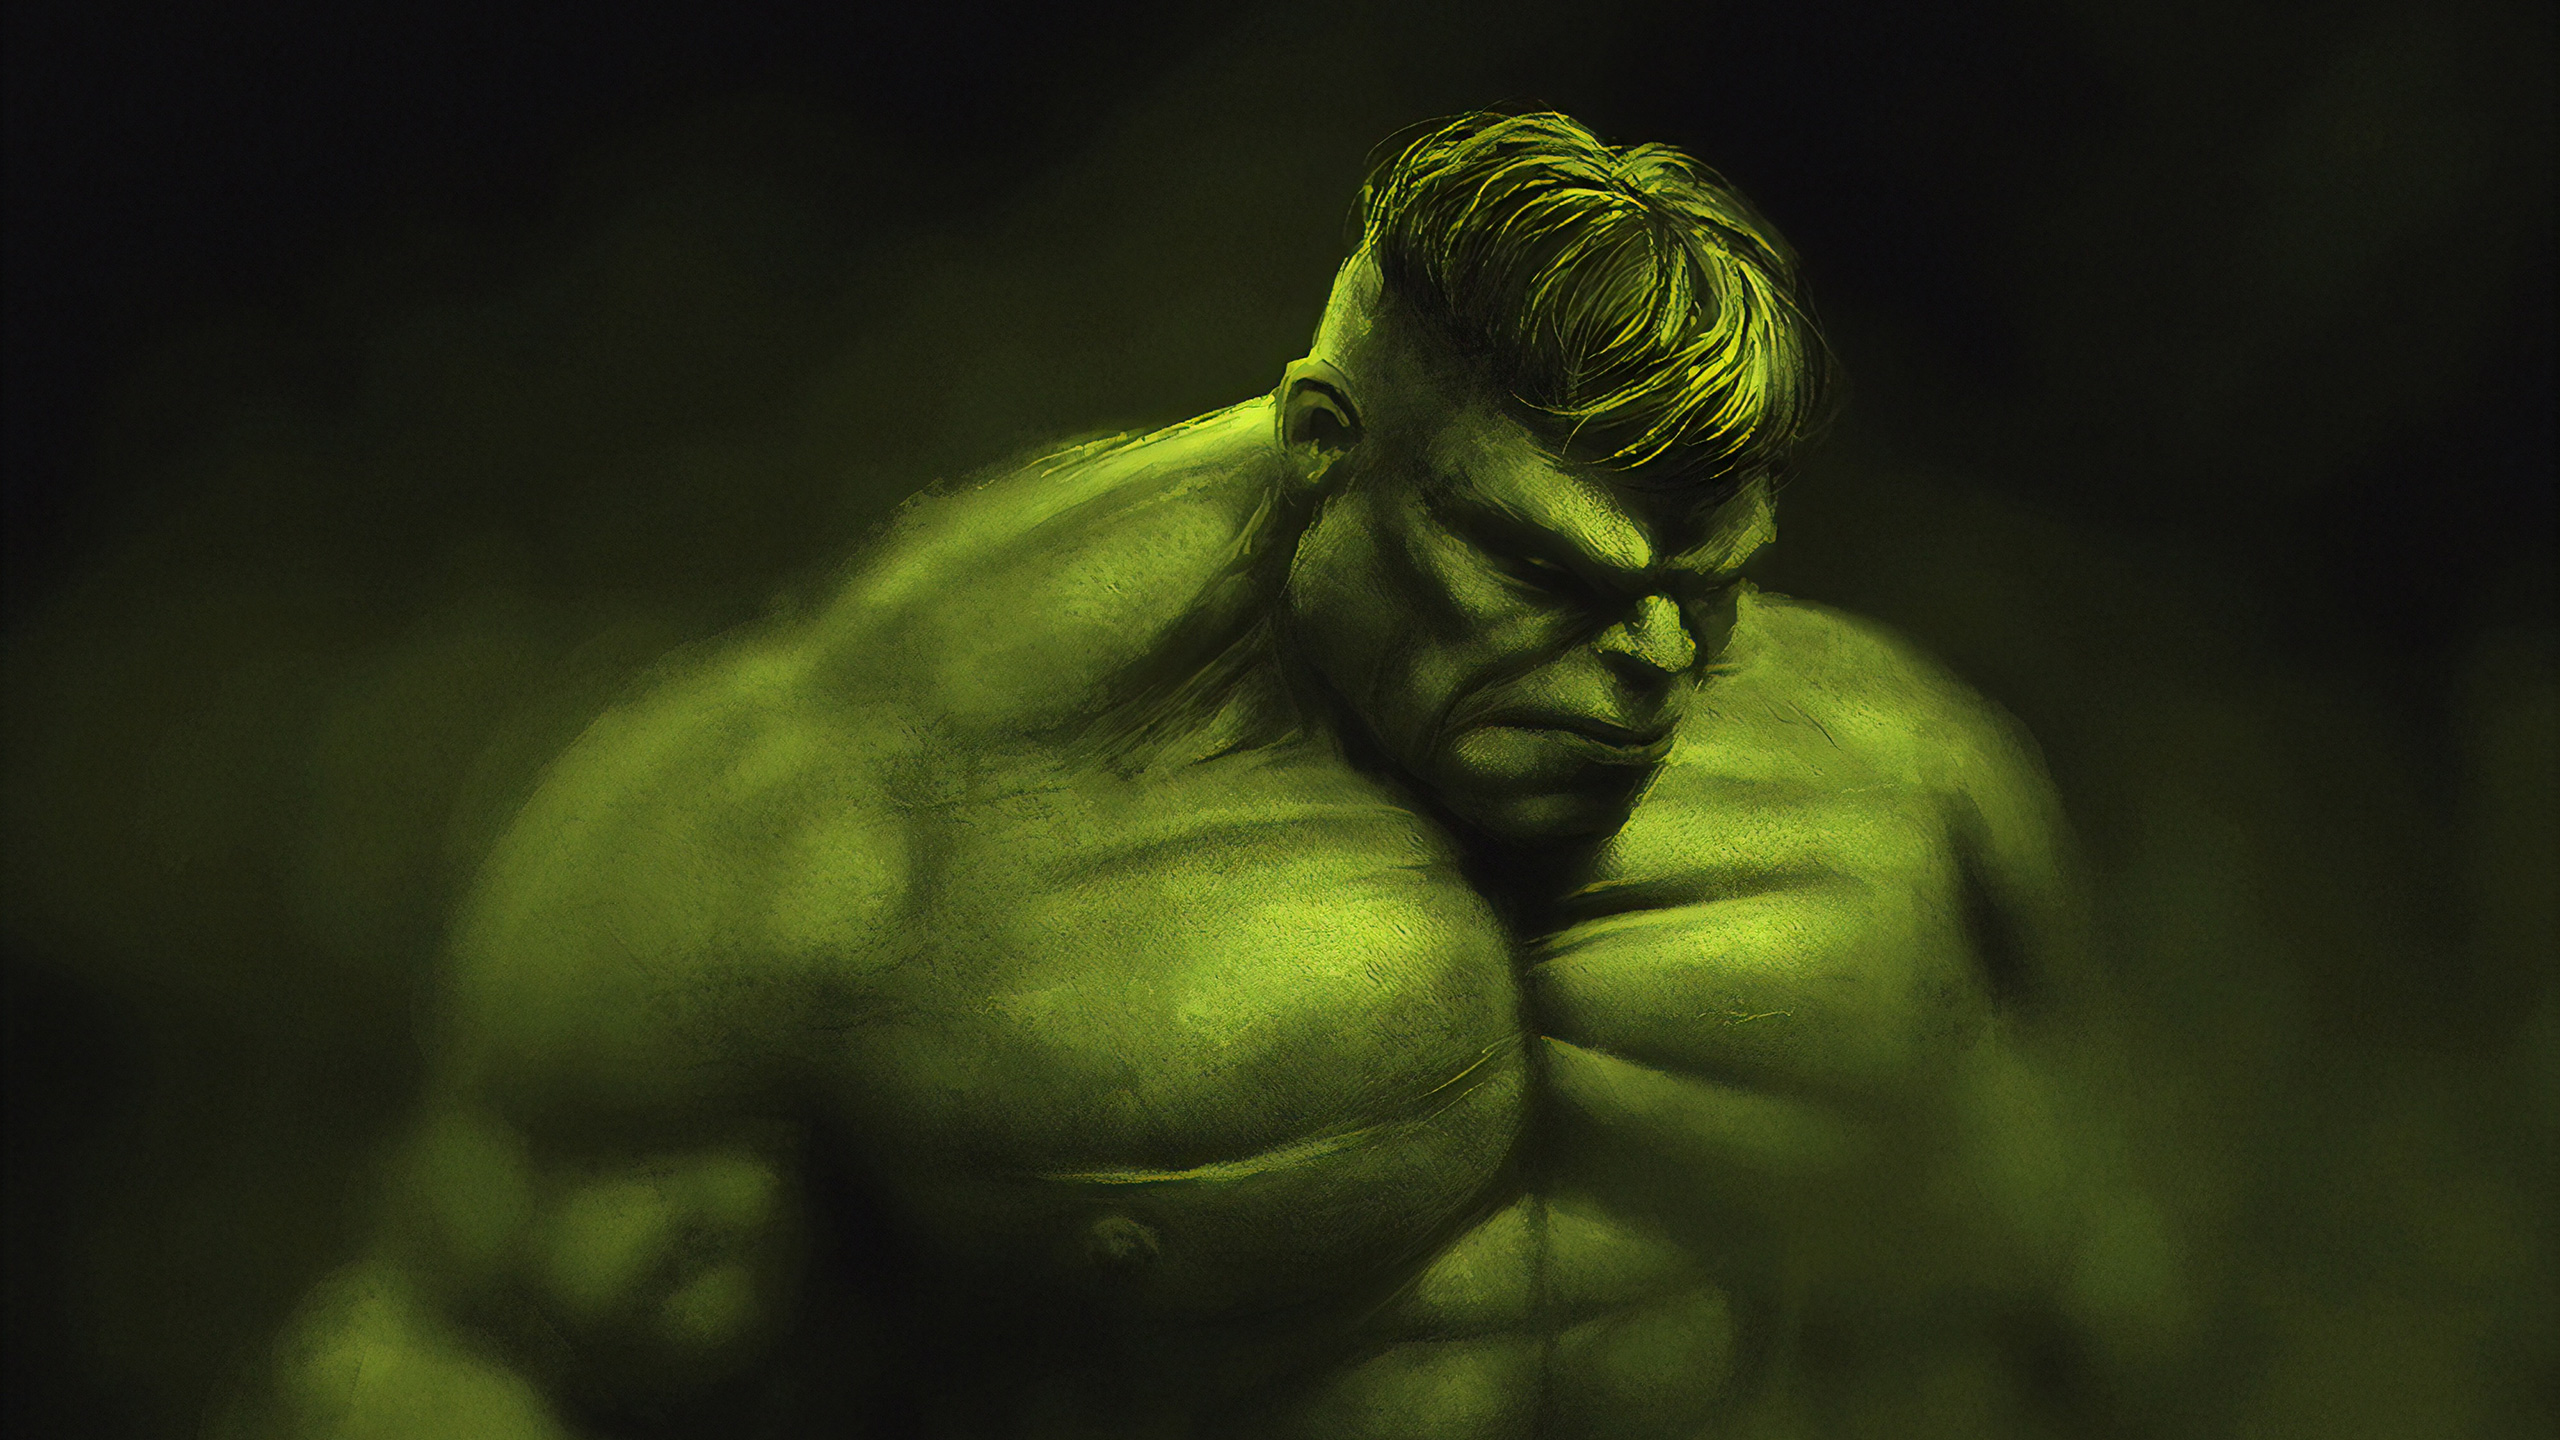 General 2560x1440 digital digital art artwork illustration Hulk Bruce Banner Marvel Comics Marvel Cinematic Universe The Avengers green dark fictional fictional character superhero fan art